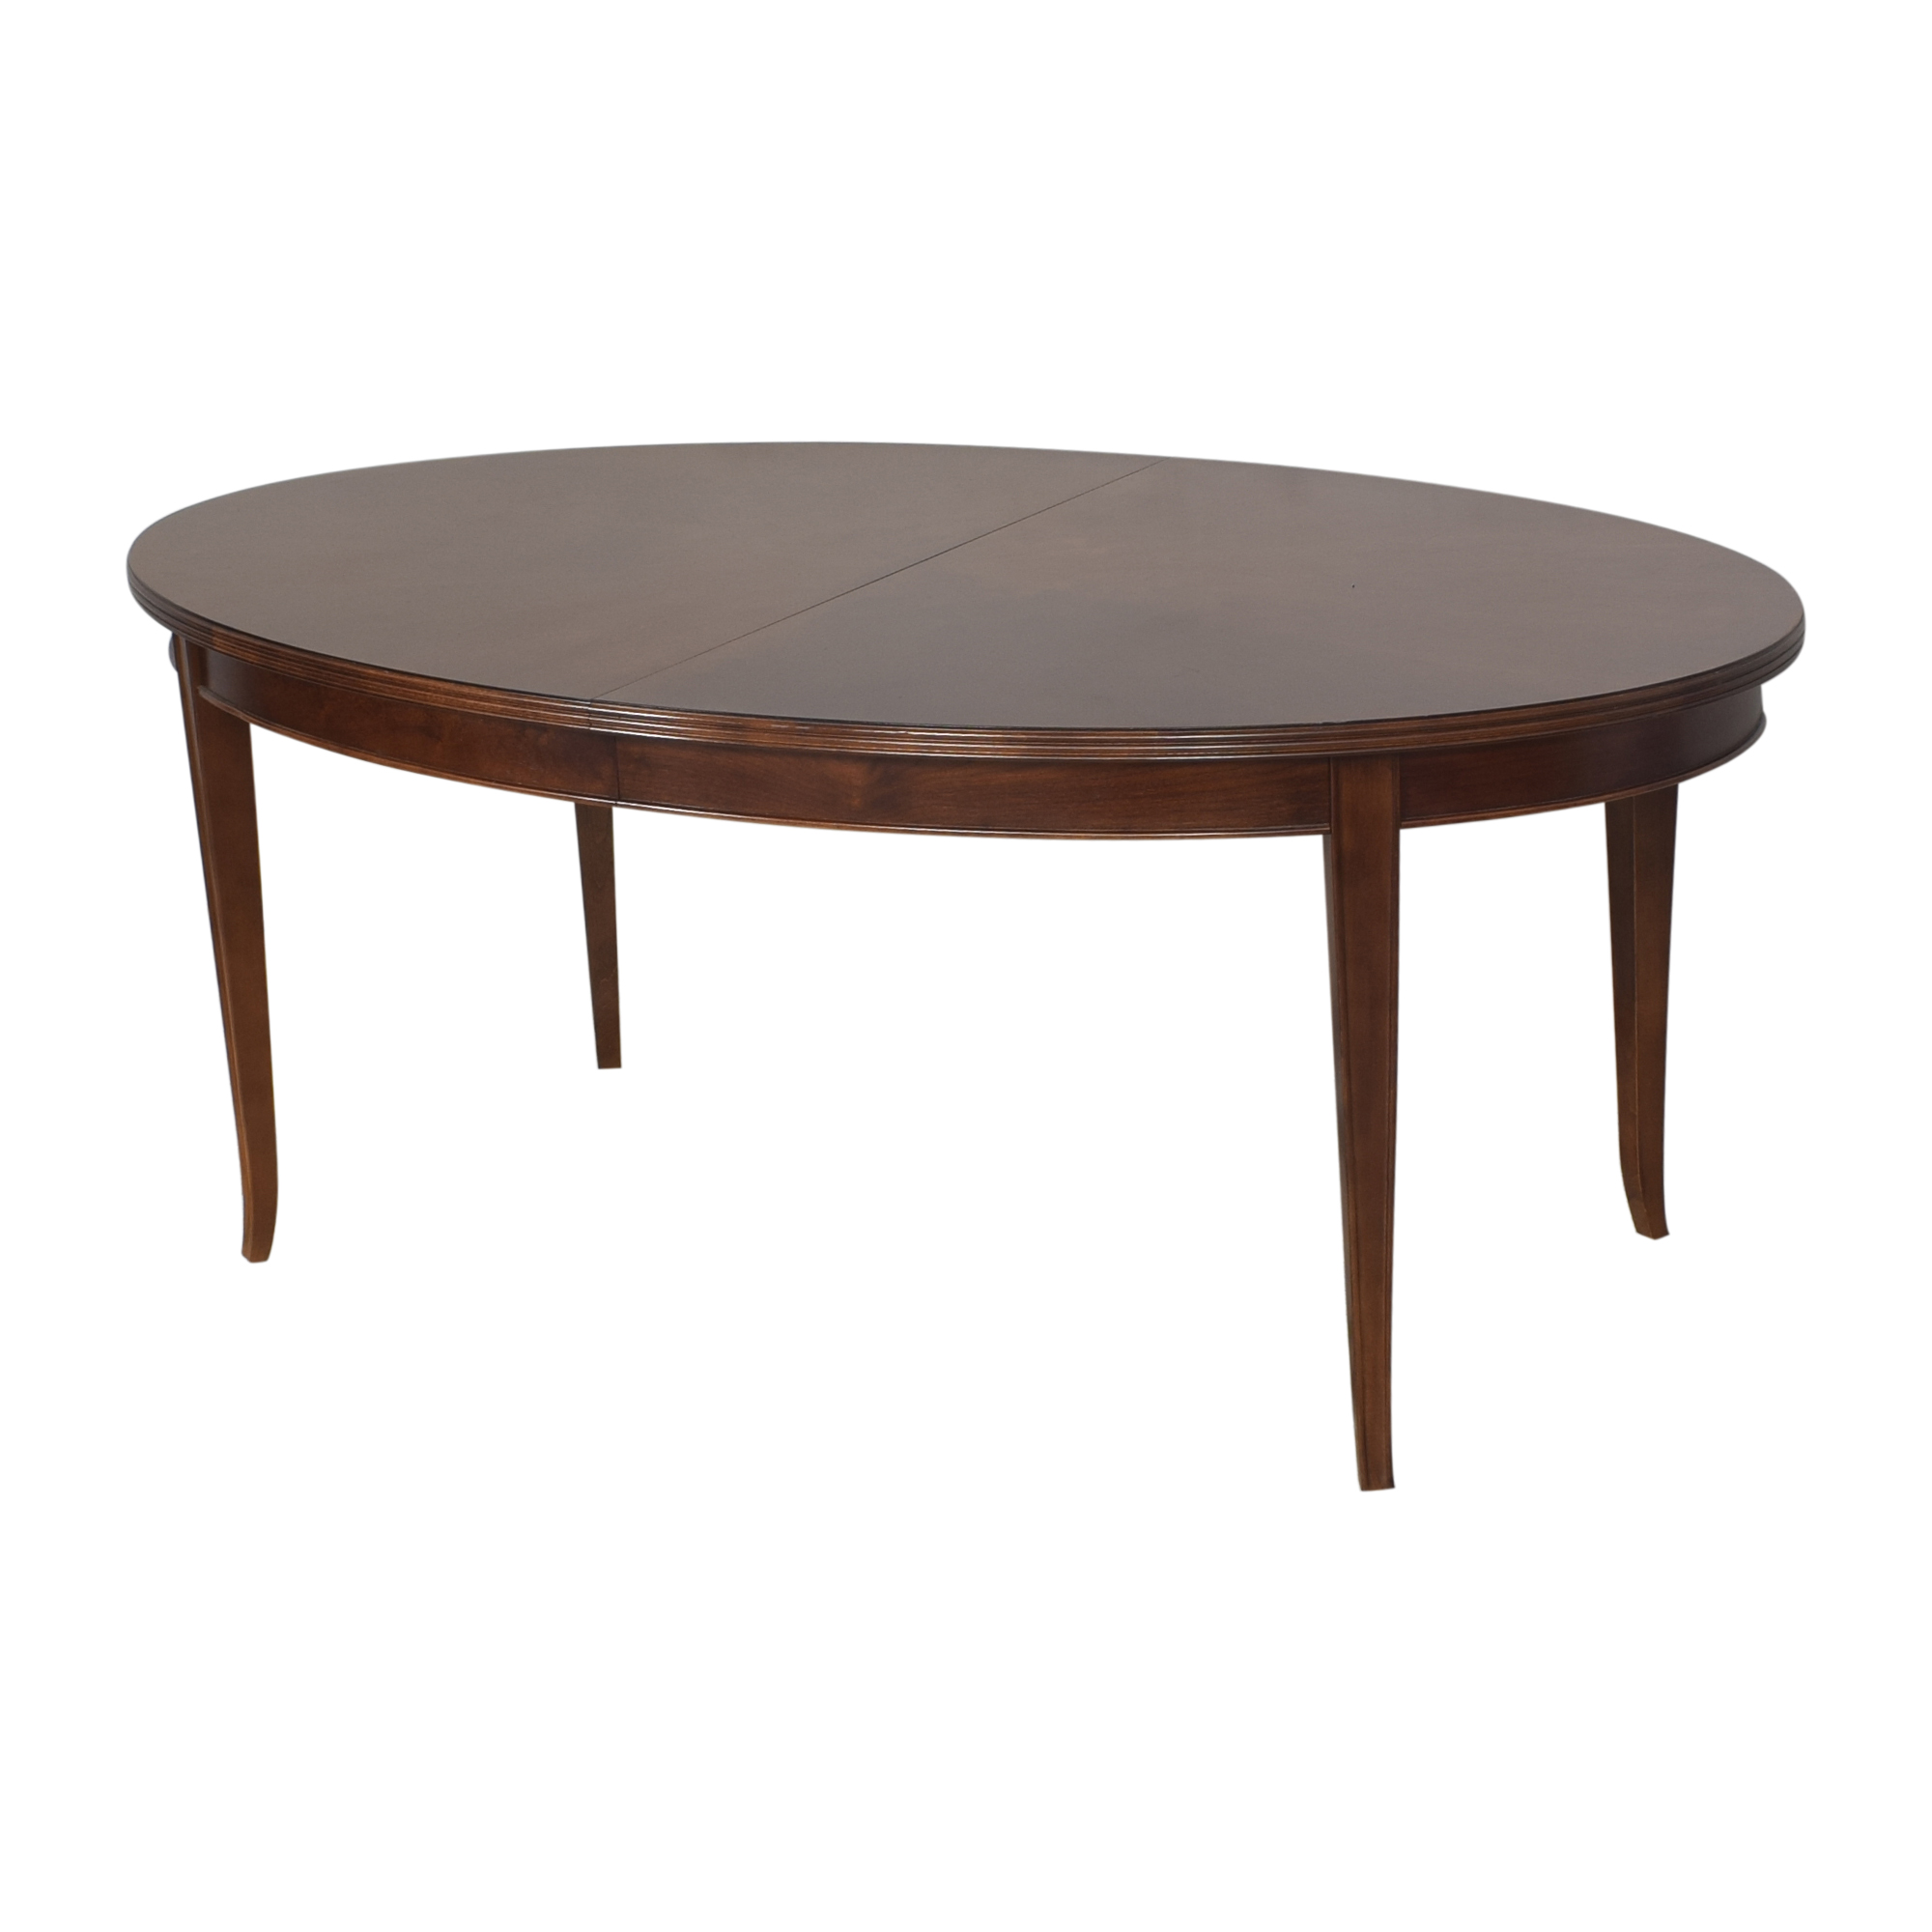 Stanley Furniture Stanley Furniture Hudson Street Riverside Dining Table for sale